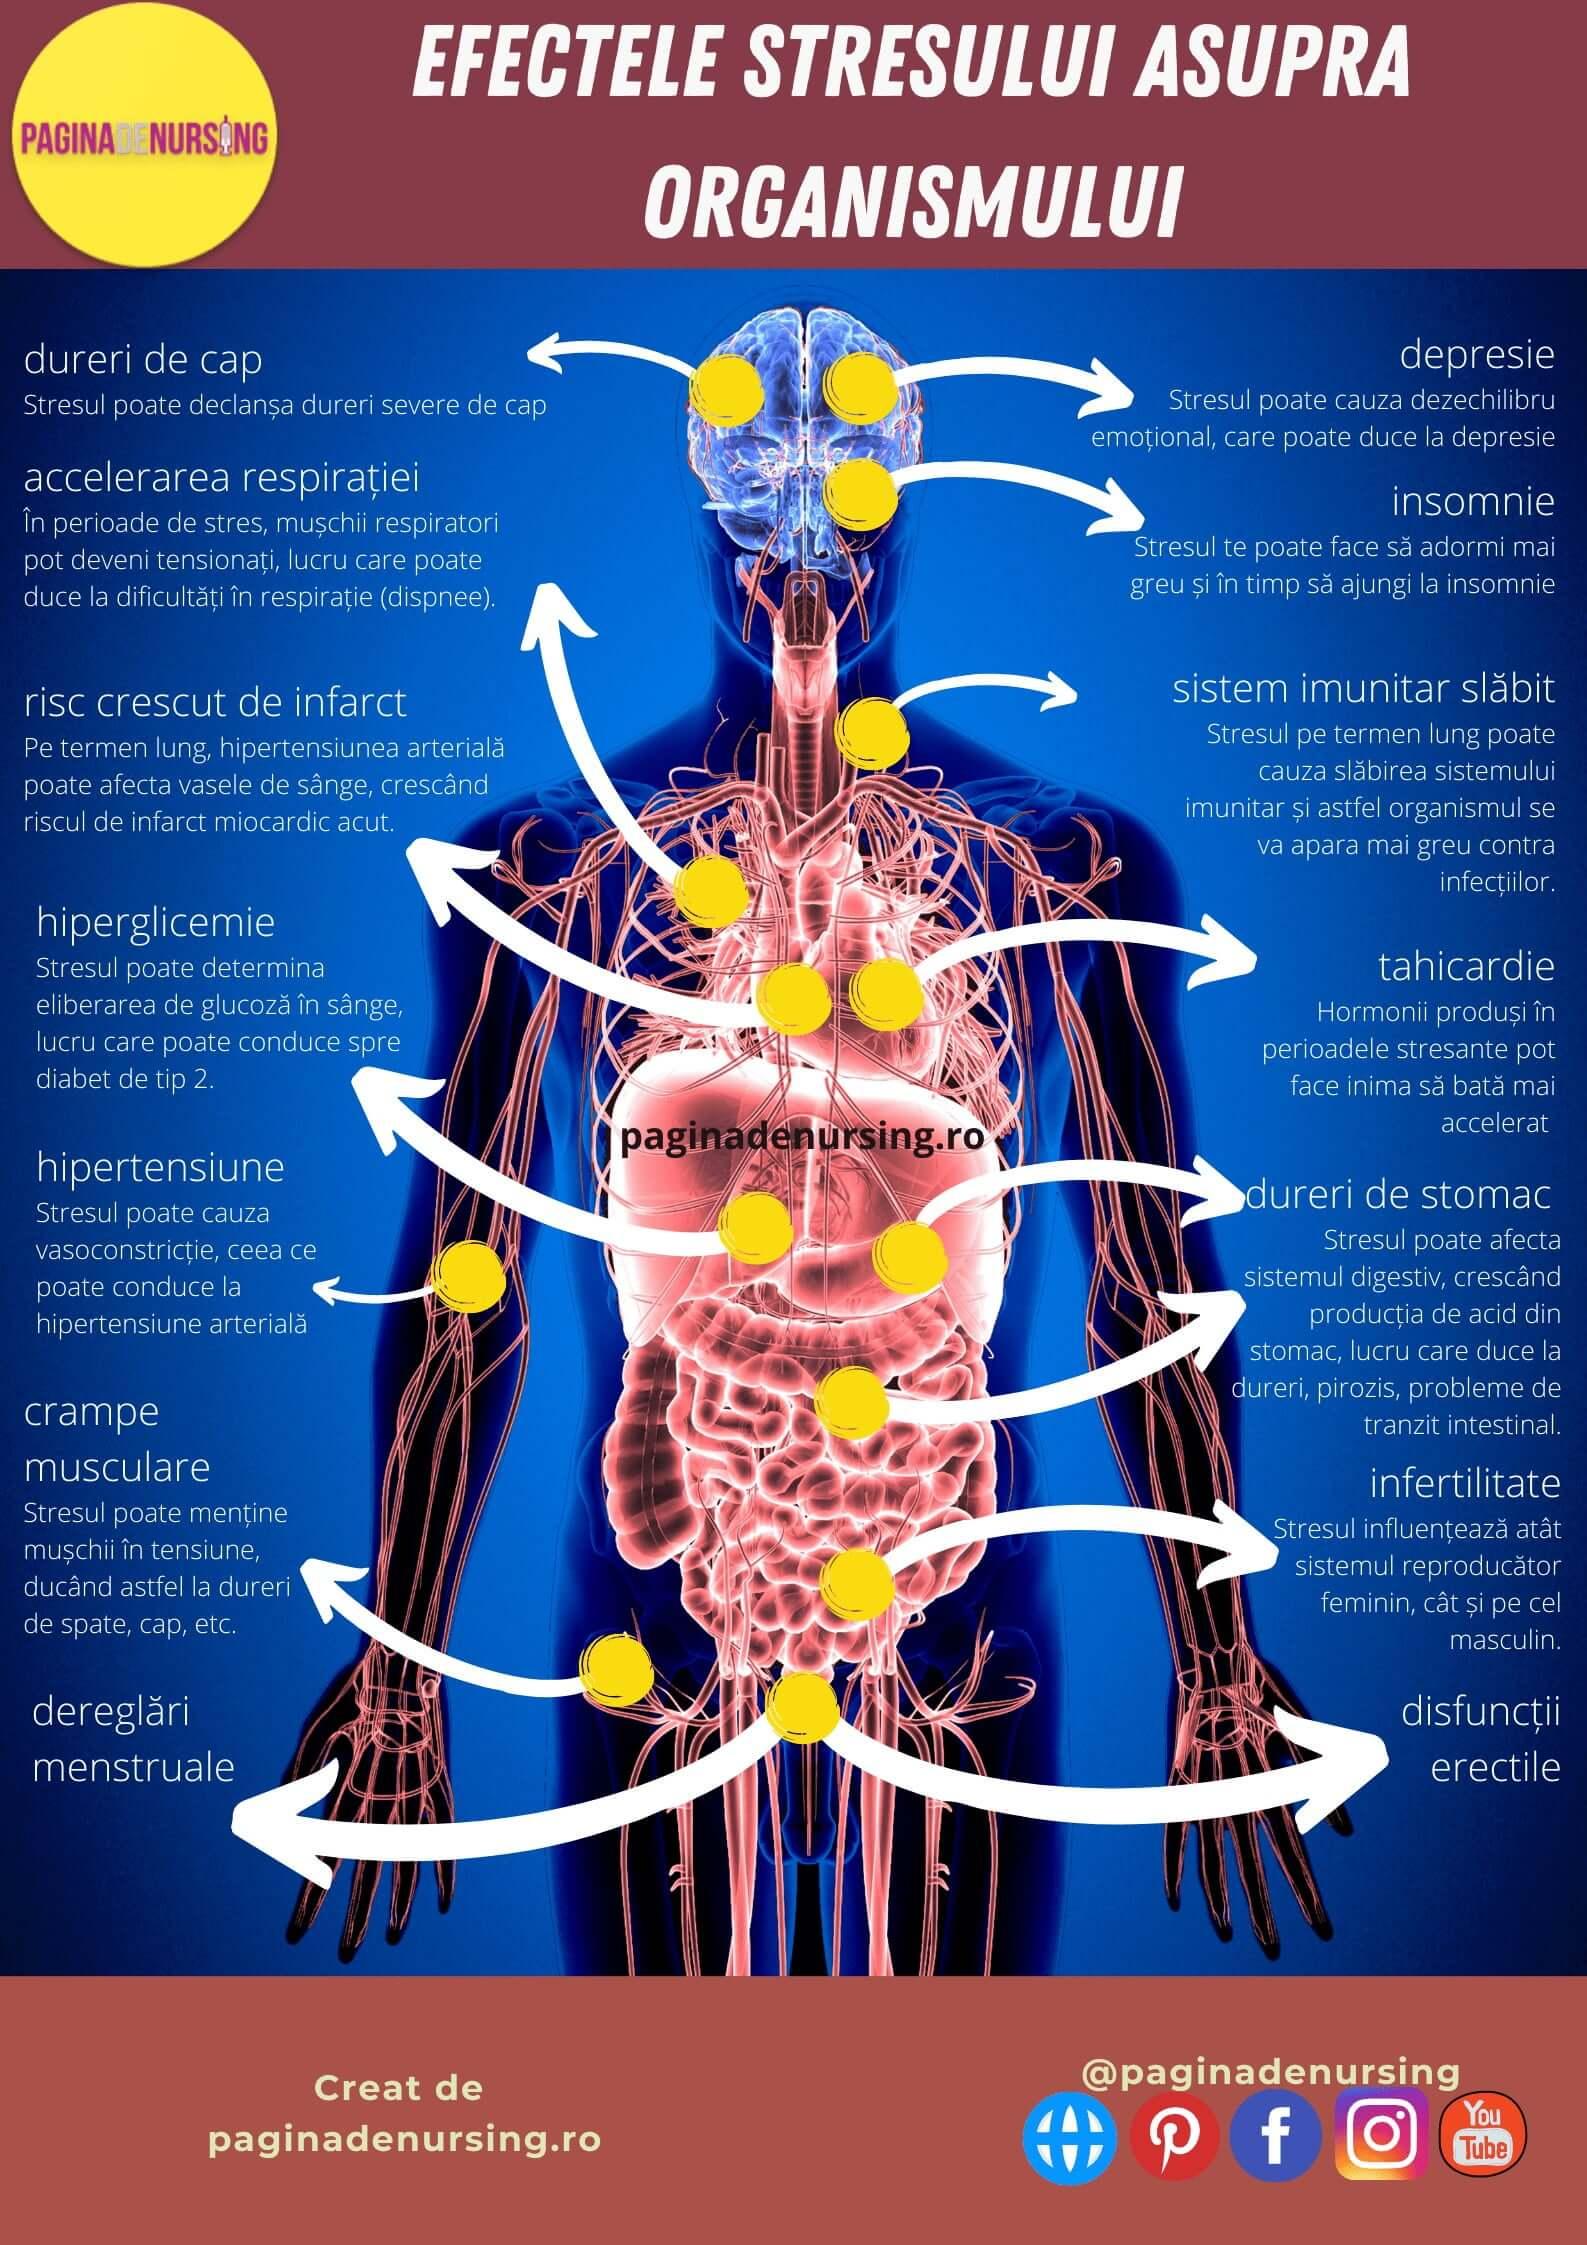 cum poate afecta stresul organismul paginadenursing